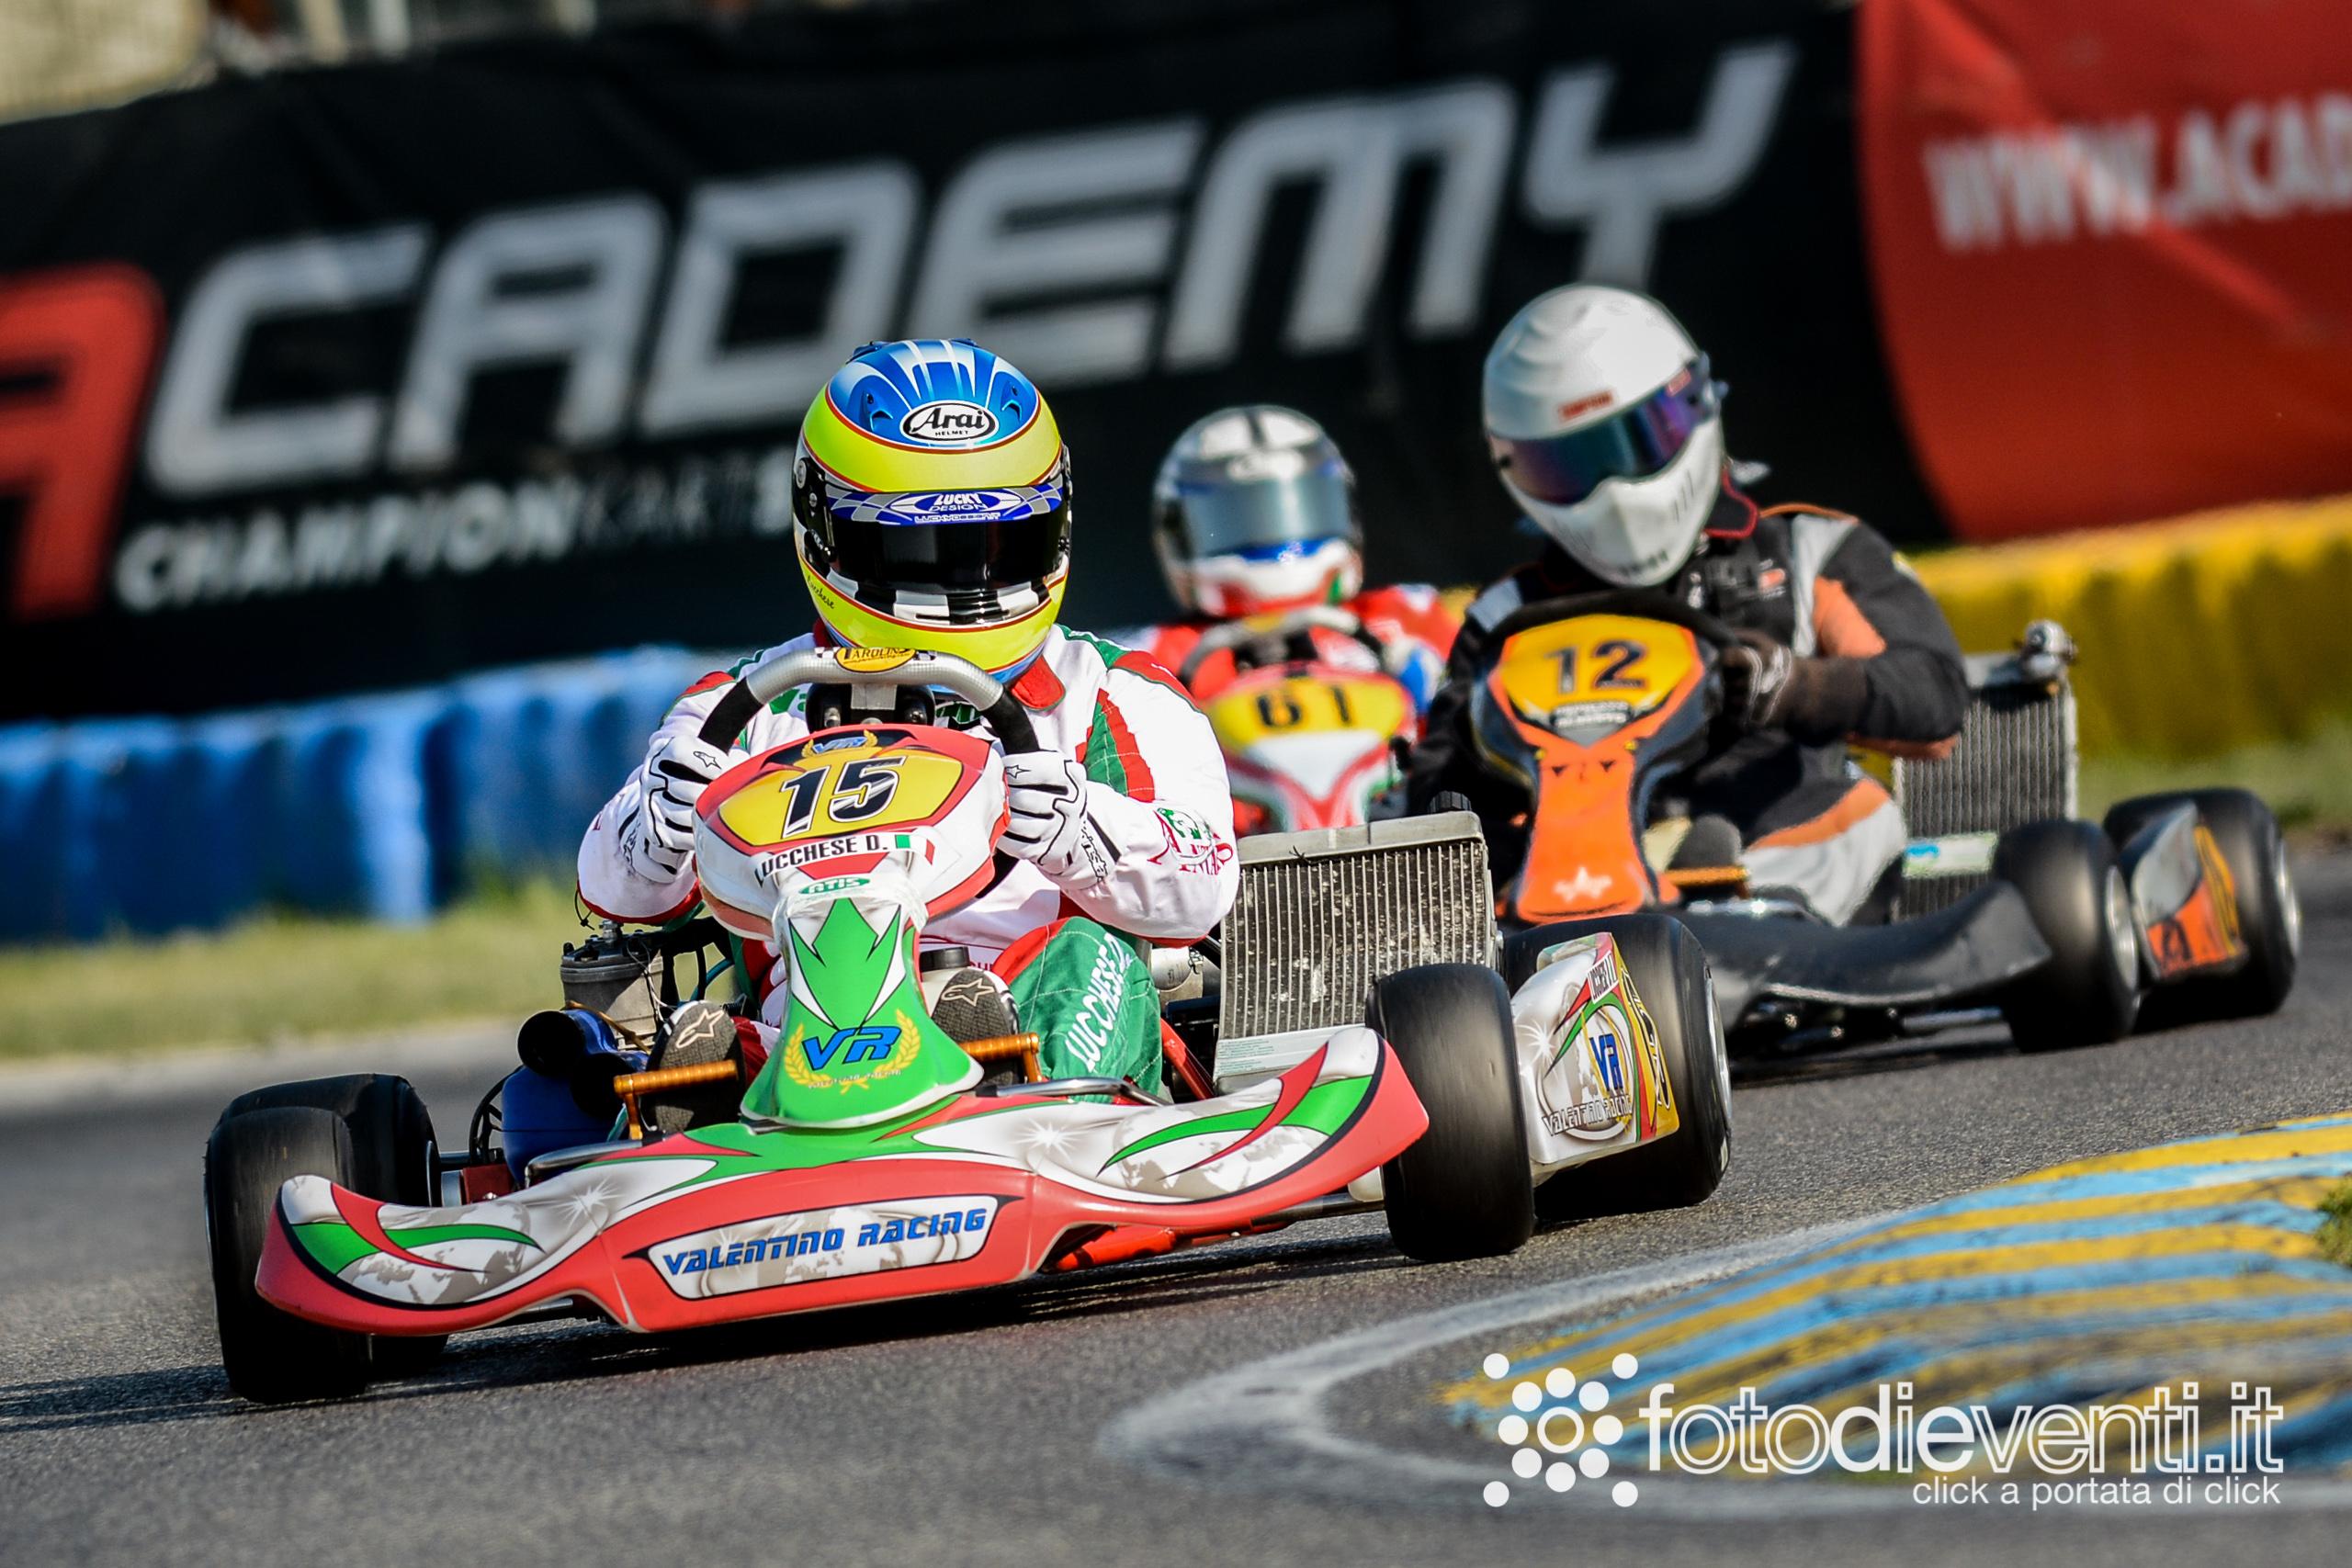 Championkart2014-1 @ Castelletto